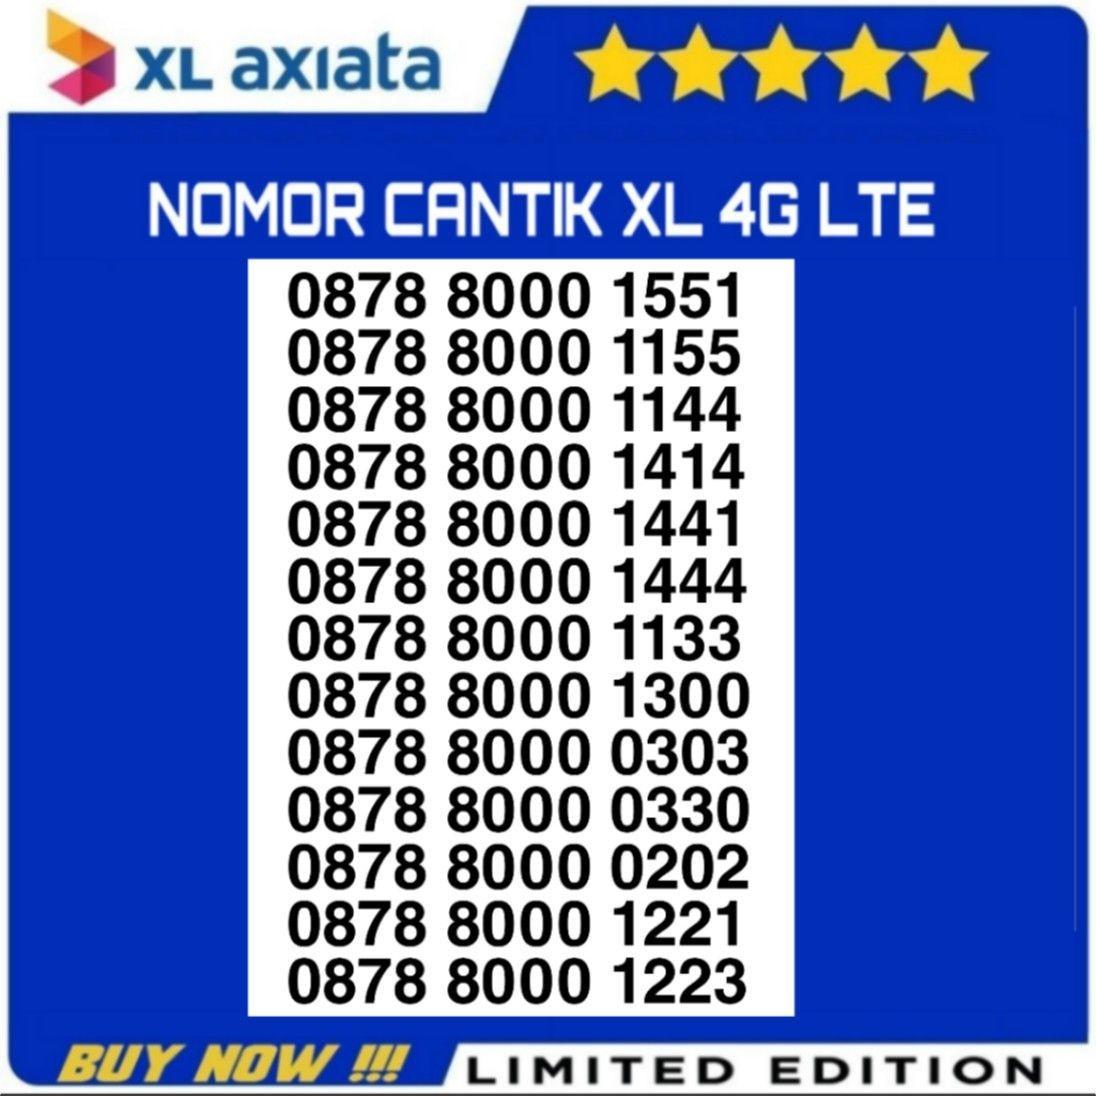 Nomor Cantik XL, Kartu Perdana XL 4G LTE, Nocan XL Murah